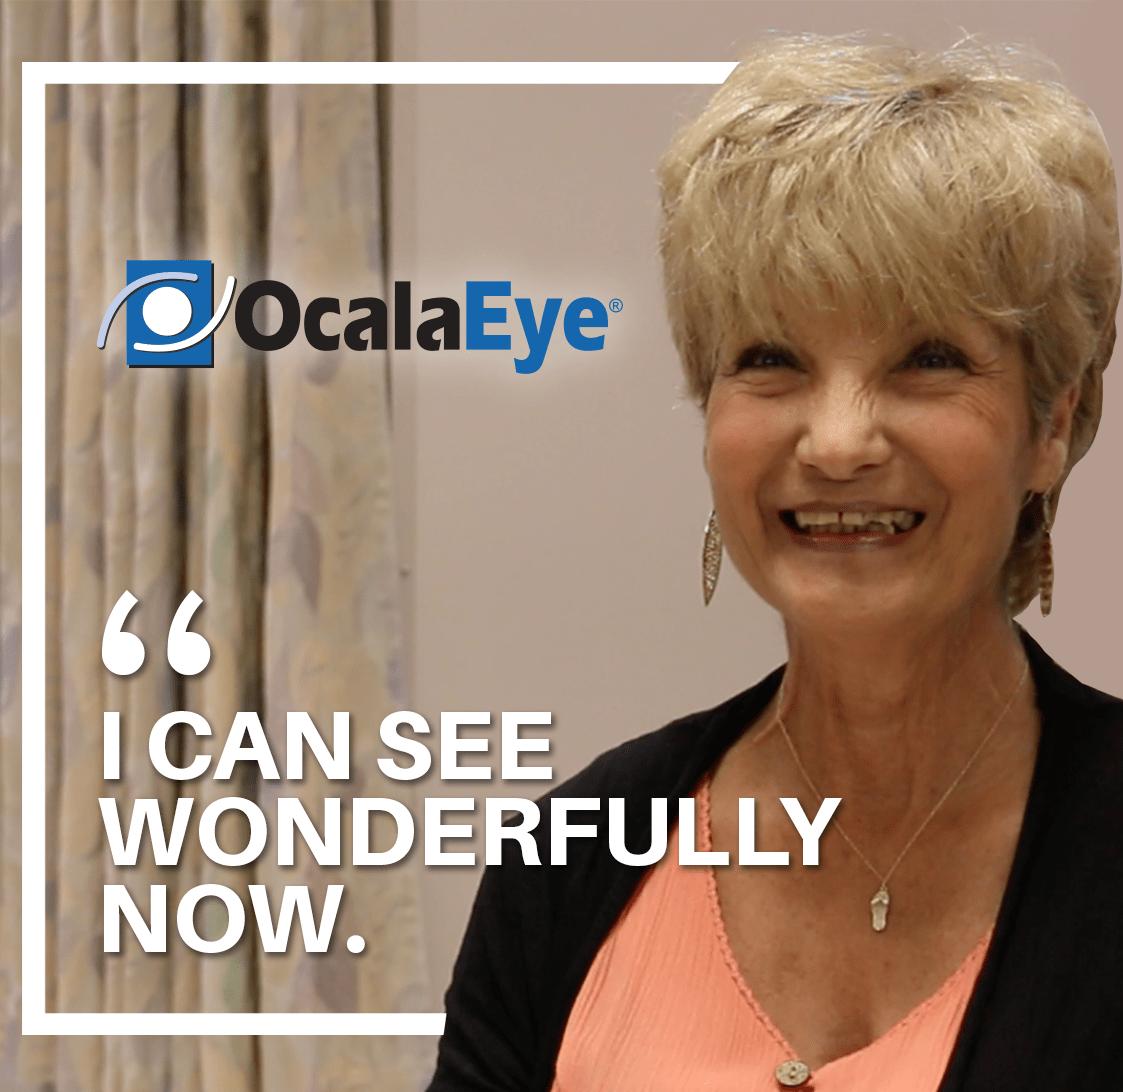 Cataract Surgery Success in Ocala